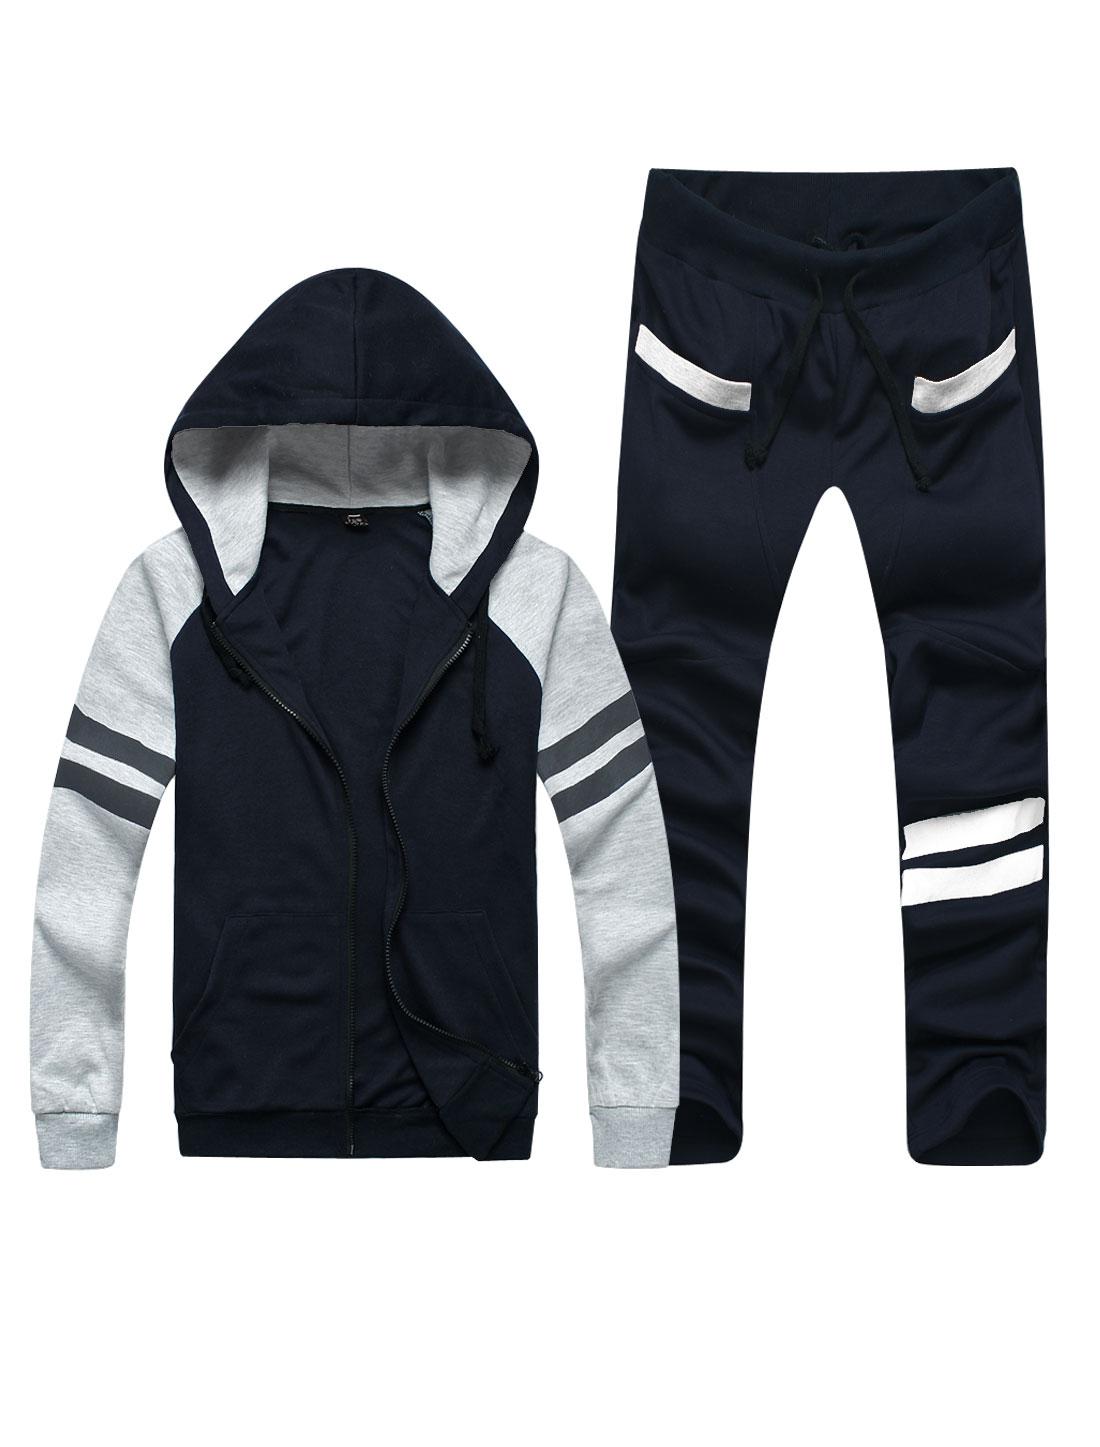 Men Hooded Zip Fly Long Sleeve Sweatshirt w Stripes Detail Pants Navy Blue S